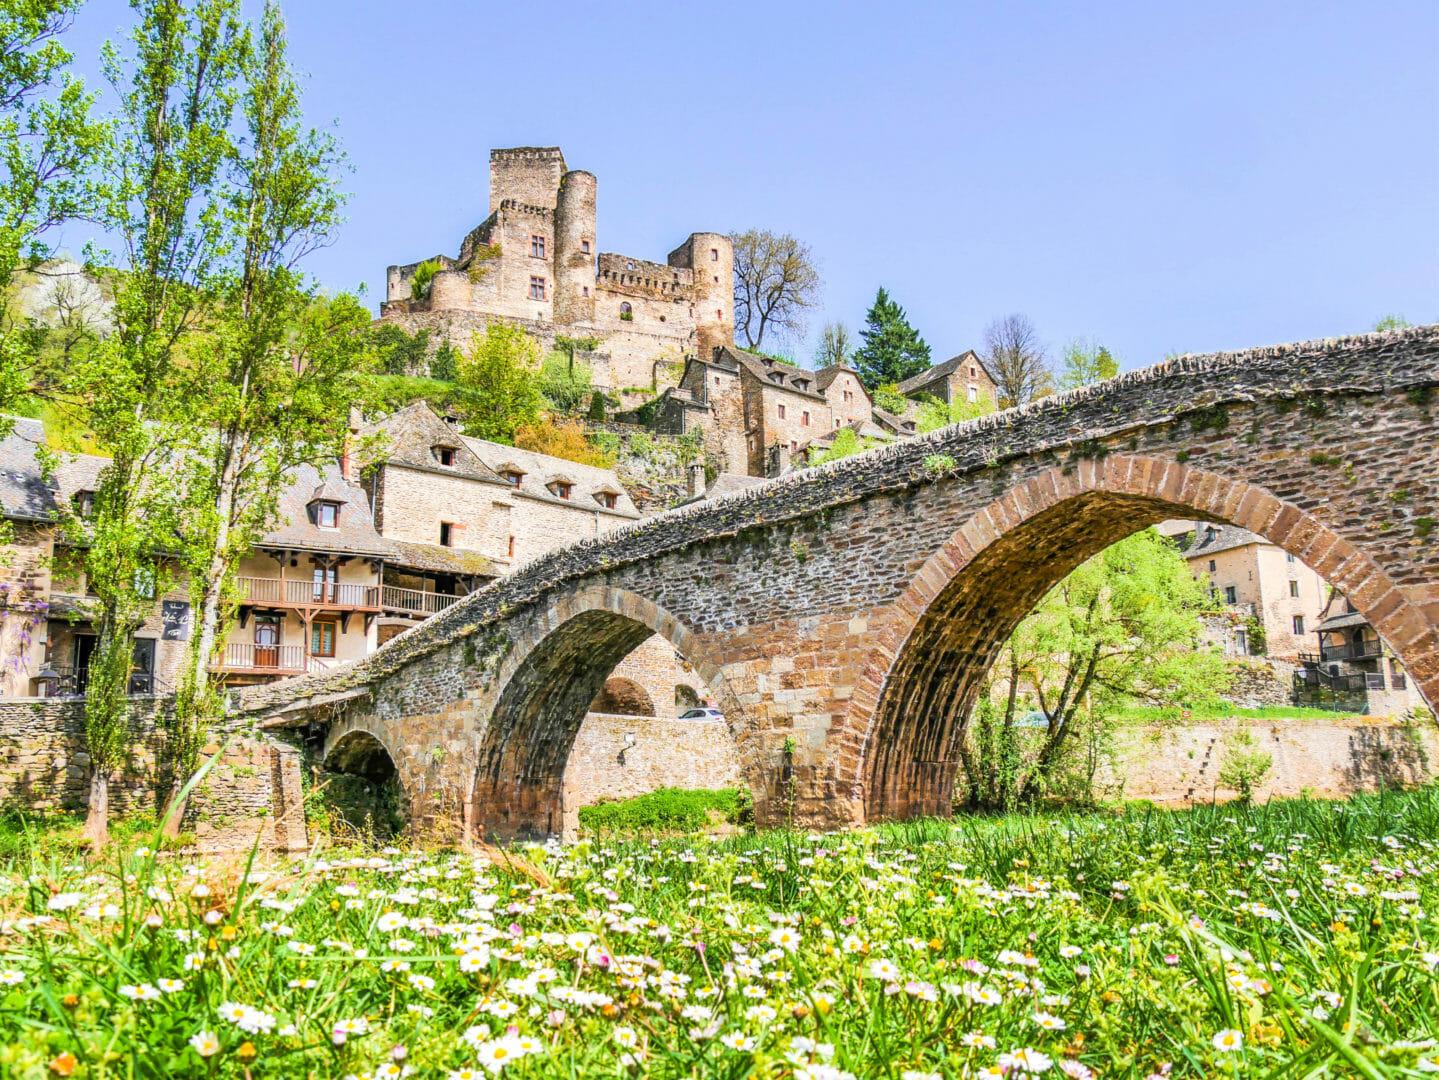 Belcastel Aveyron Visiter la France hors des sentiers battus